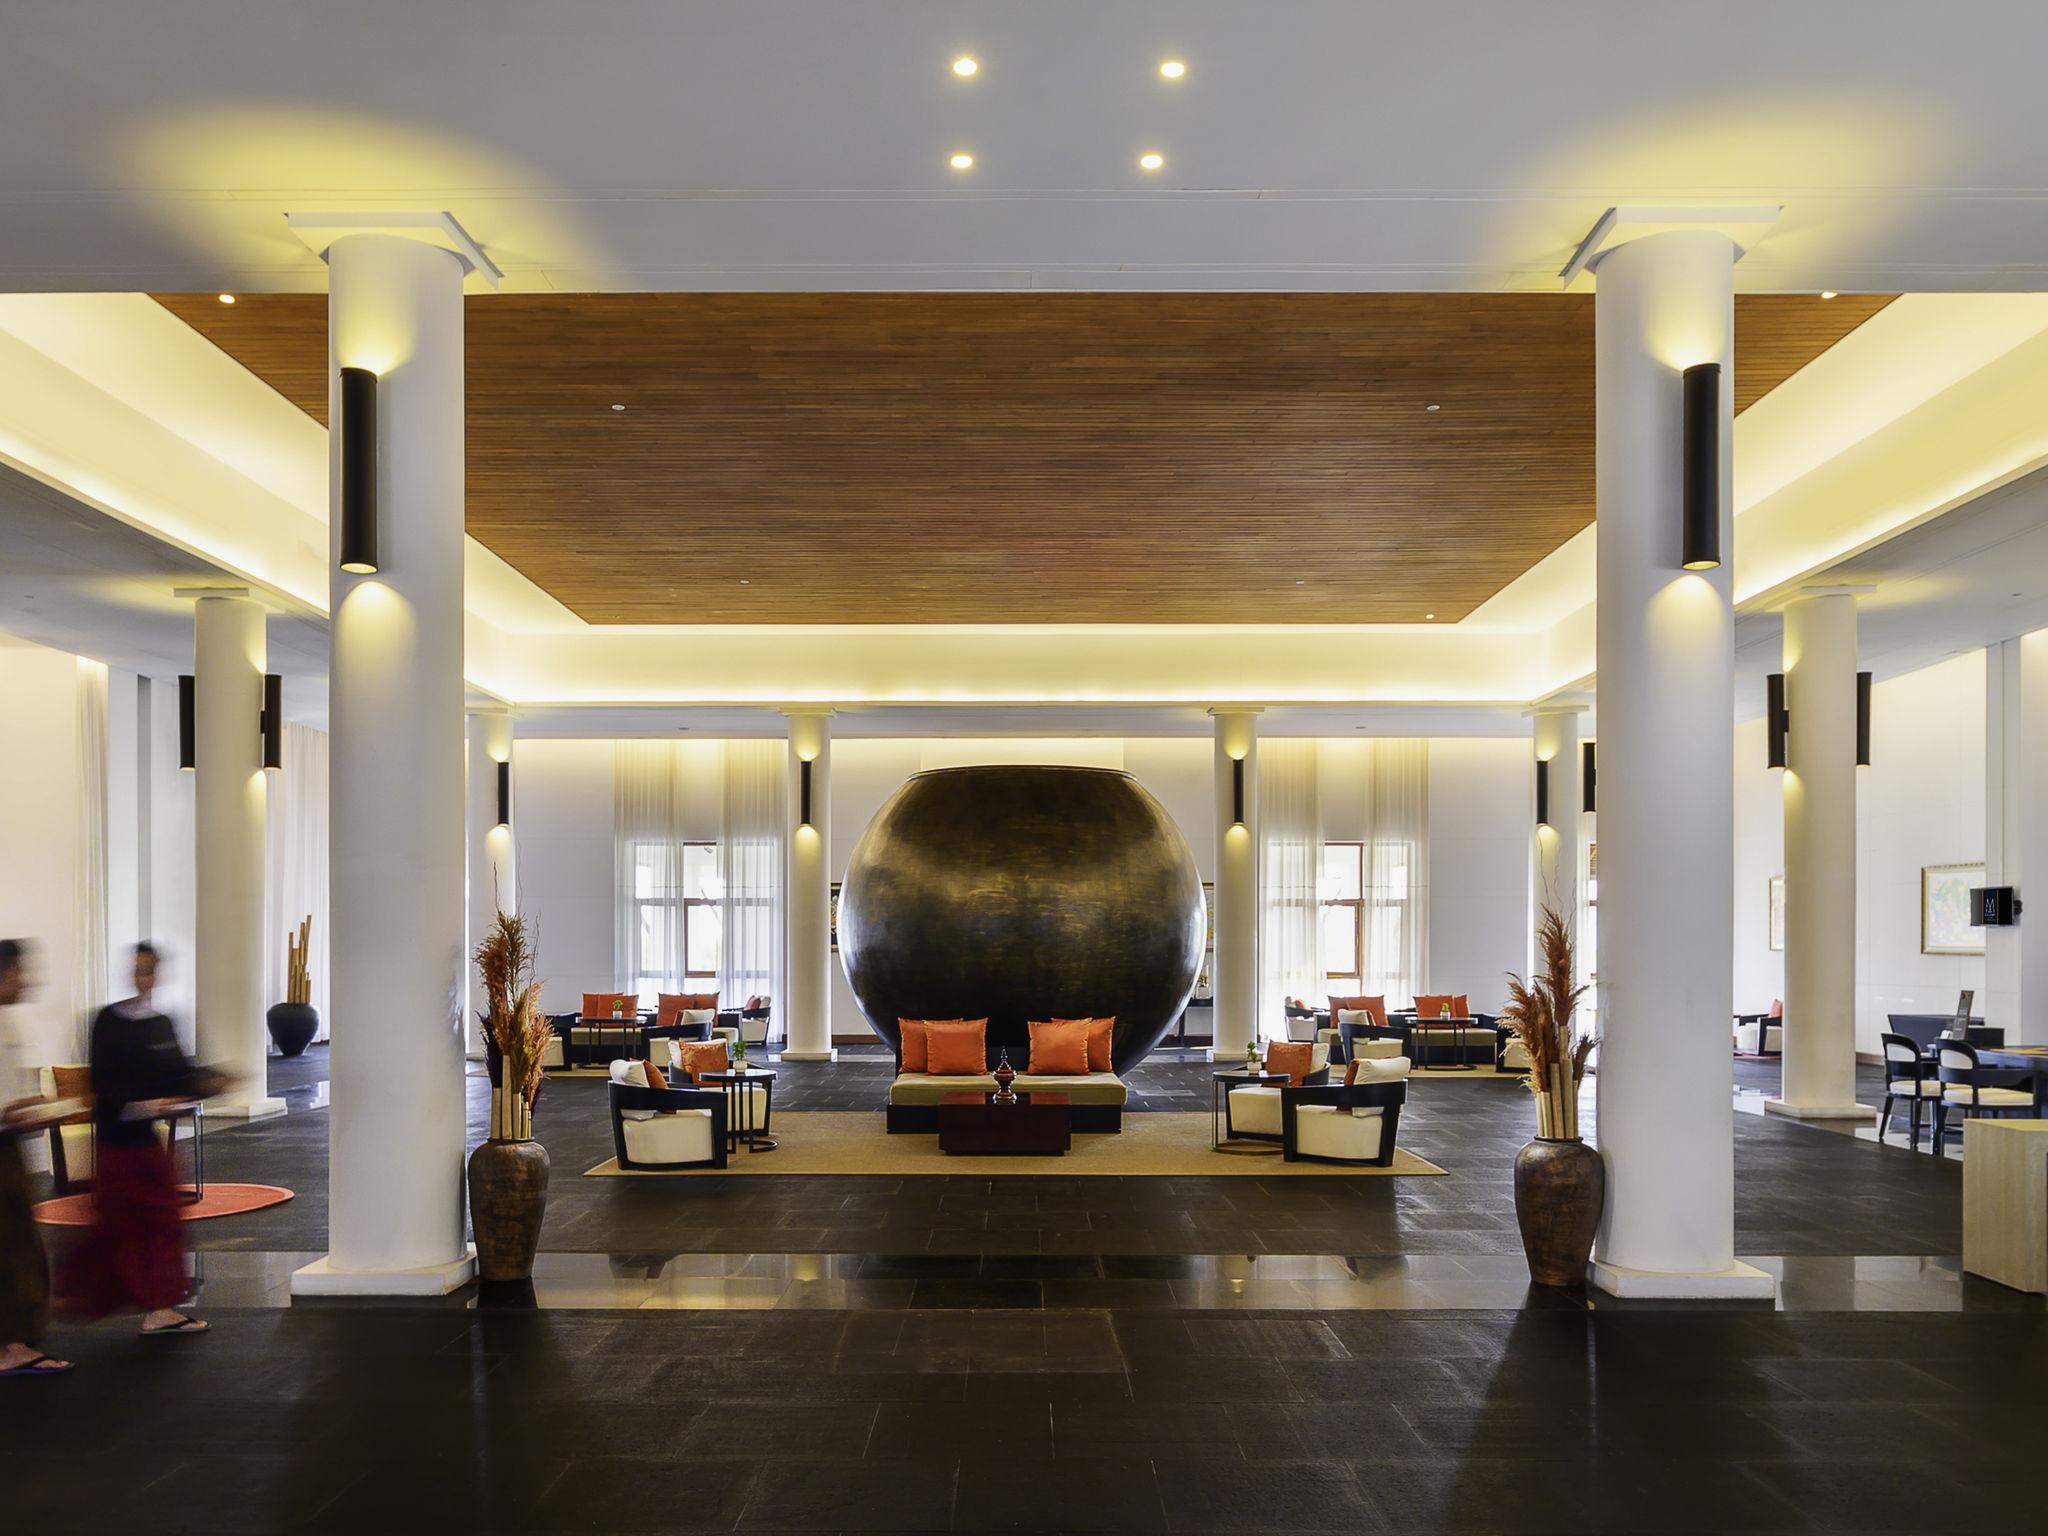 Hôtel - The Lake Garden Nay Pyi Taw - MGallery by Sofitel